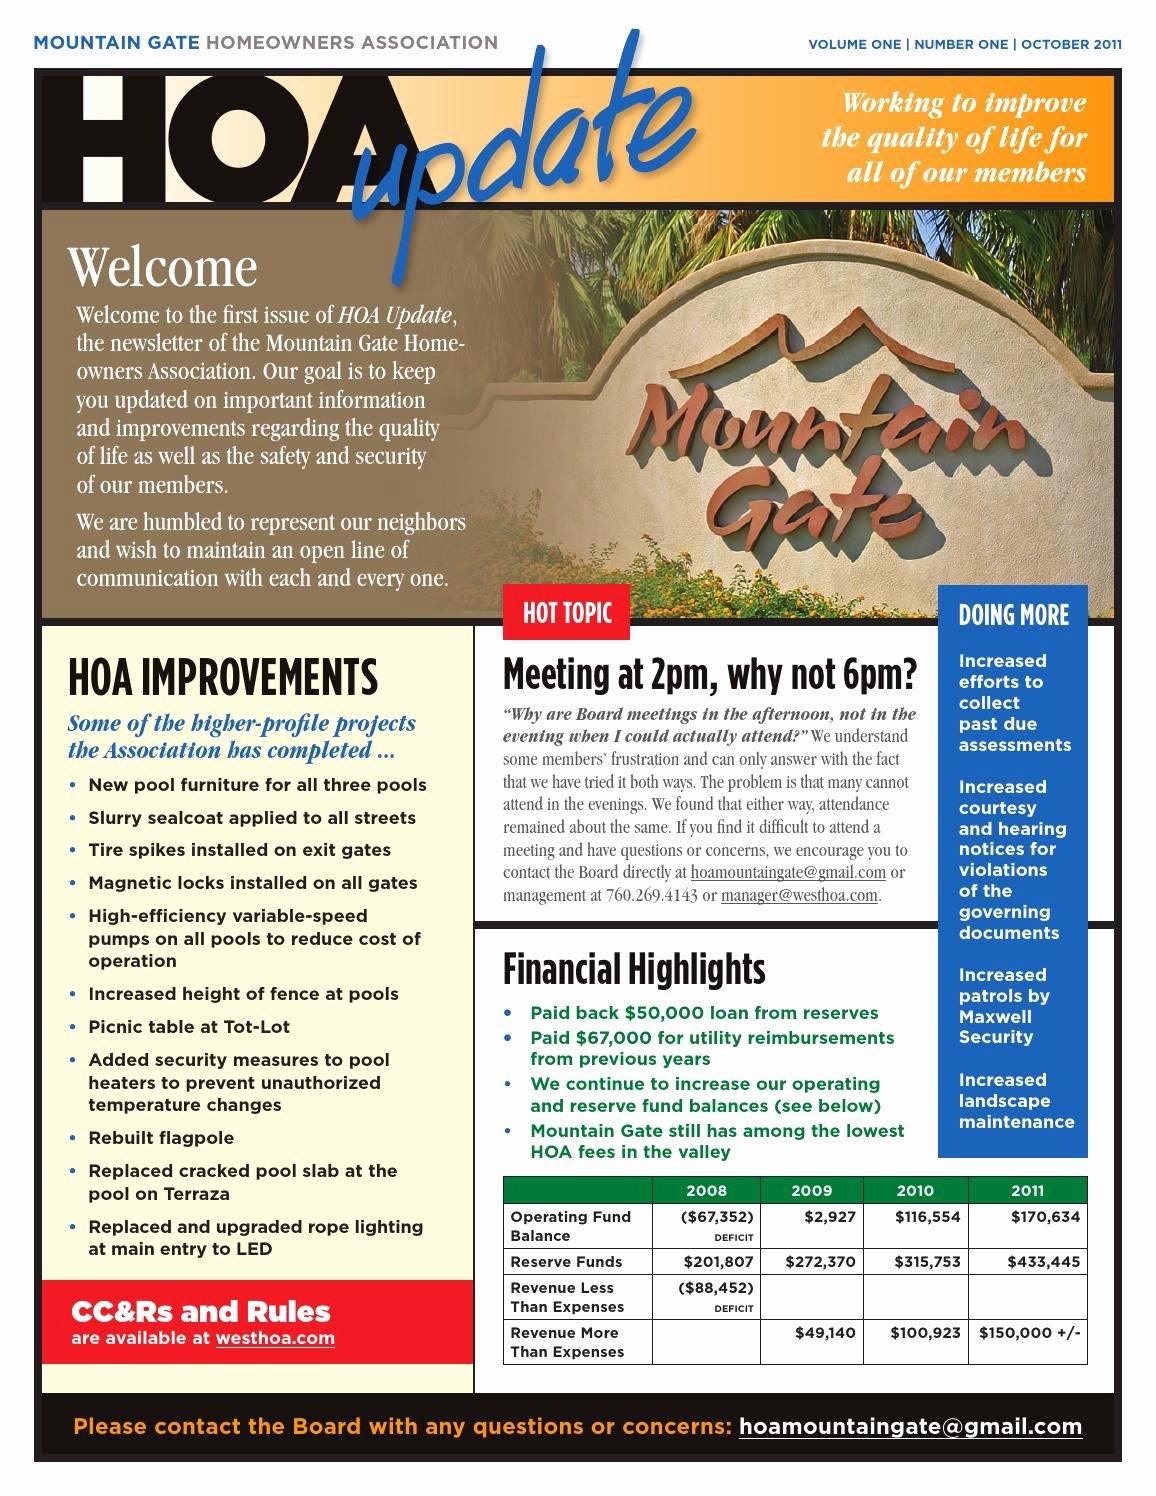 Homeowners association Newsletter Template Best Of Mountain Gate Hoa